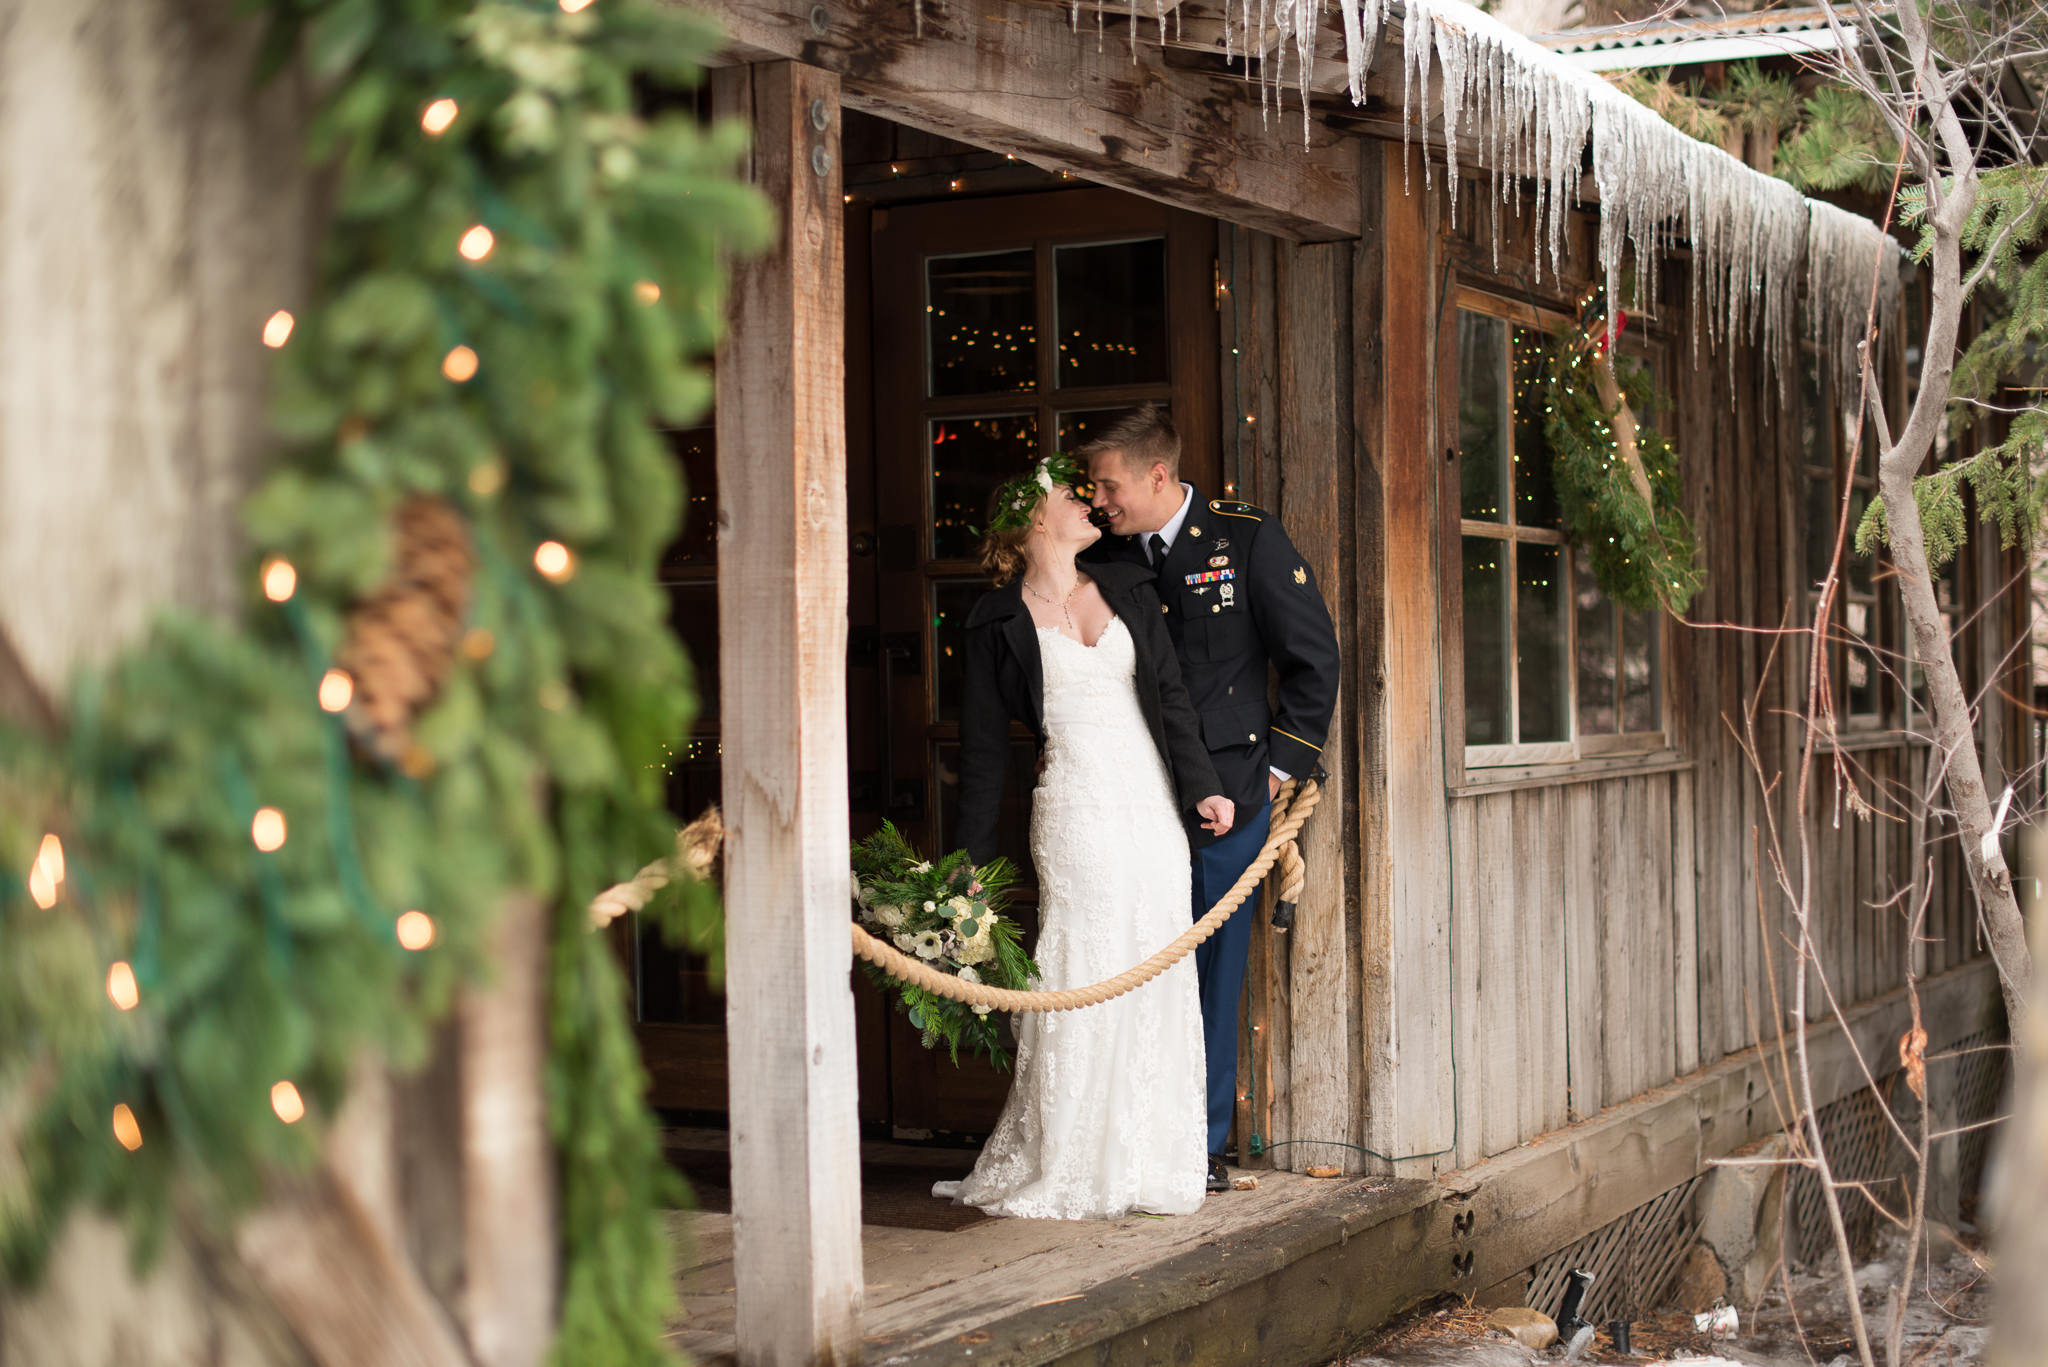 Trevor-Hooper-Wedding-Photographer-The-Bungalow-Wedding-Utah_CLR_026.jpg